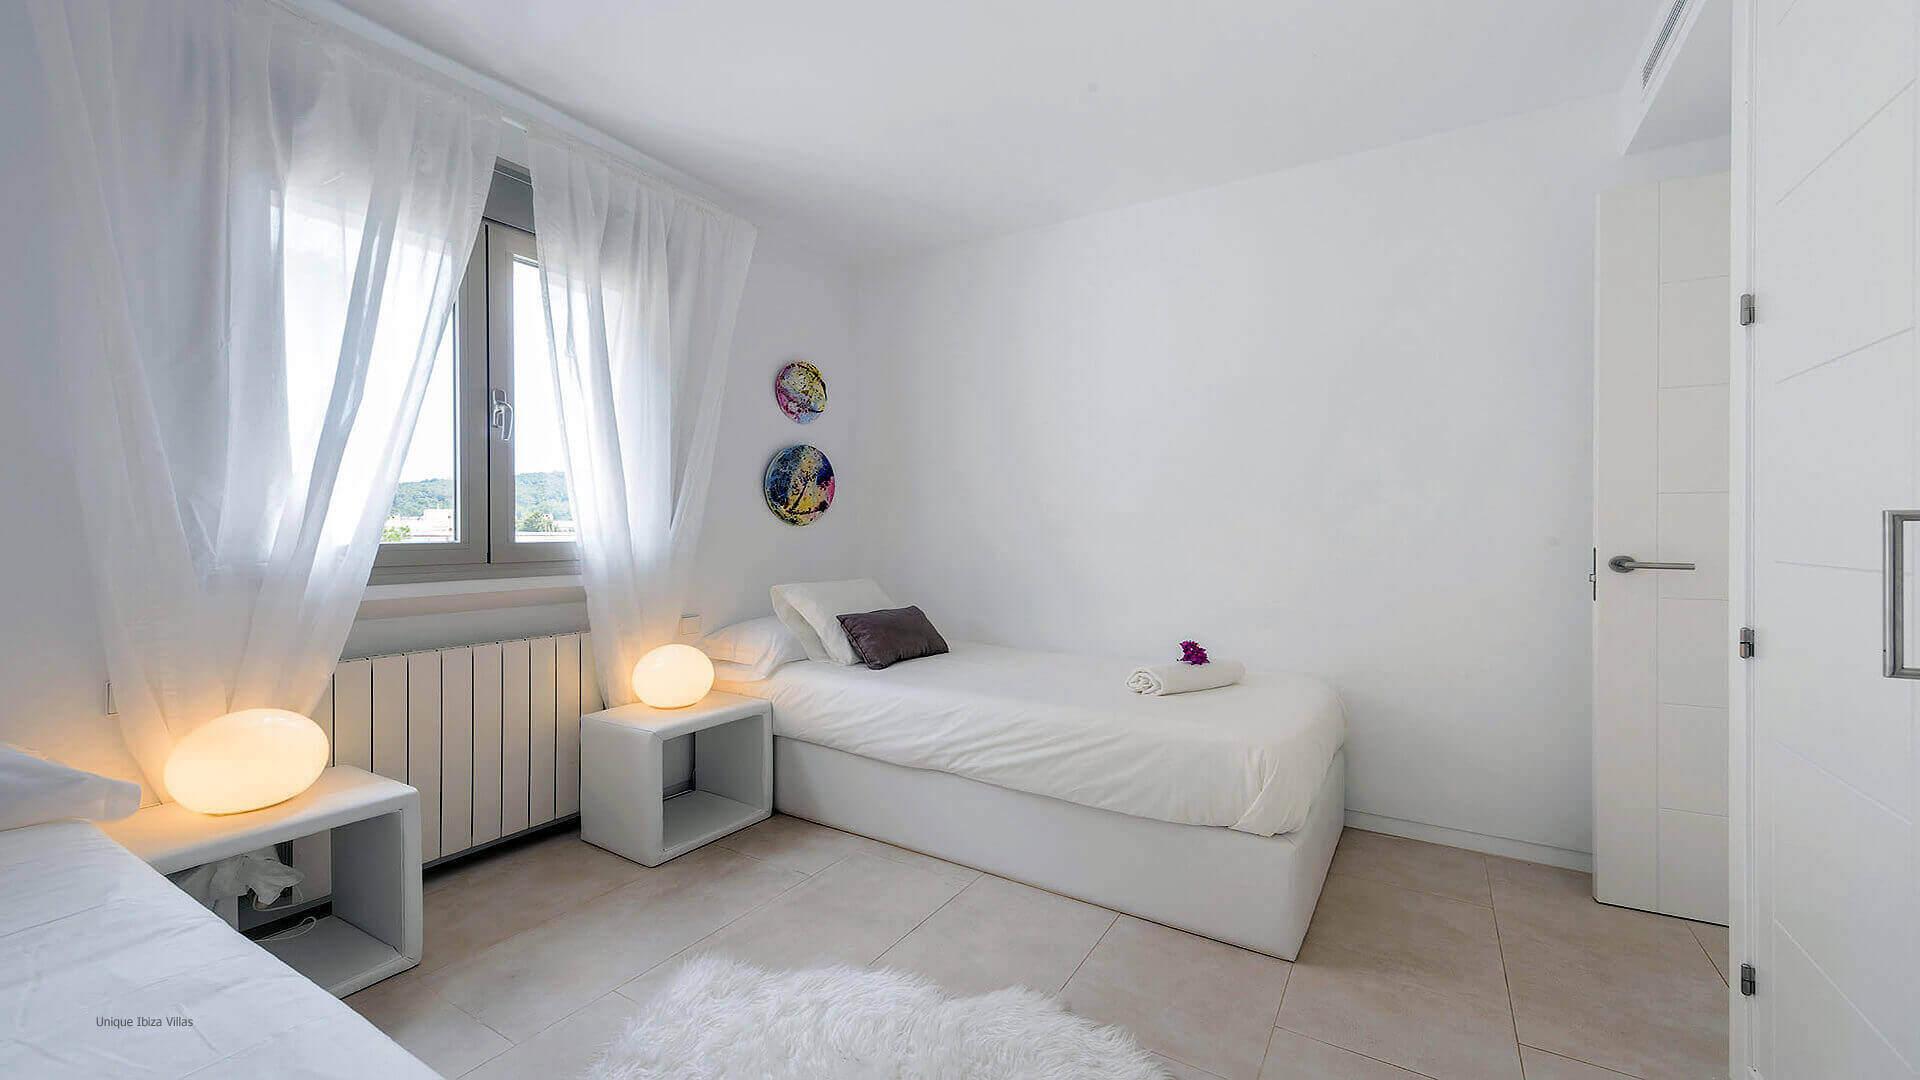 Villa Montecristo Ibiza 36 Bedroom 3